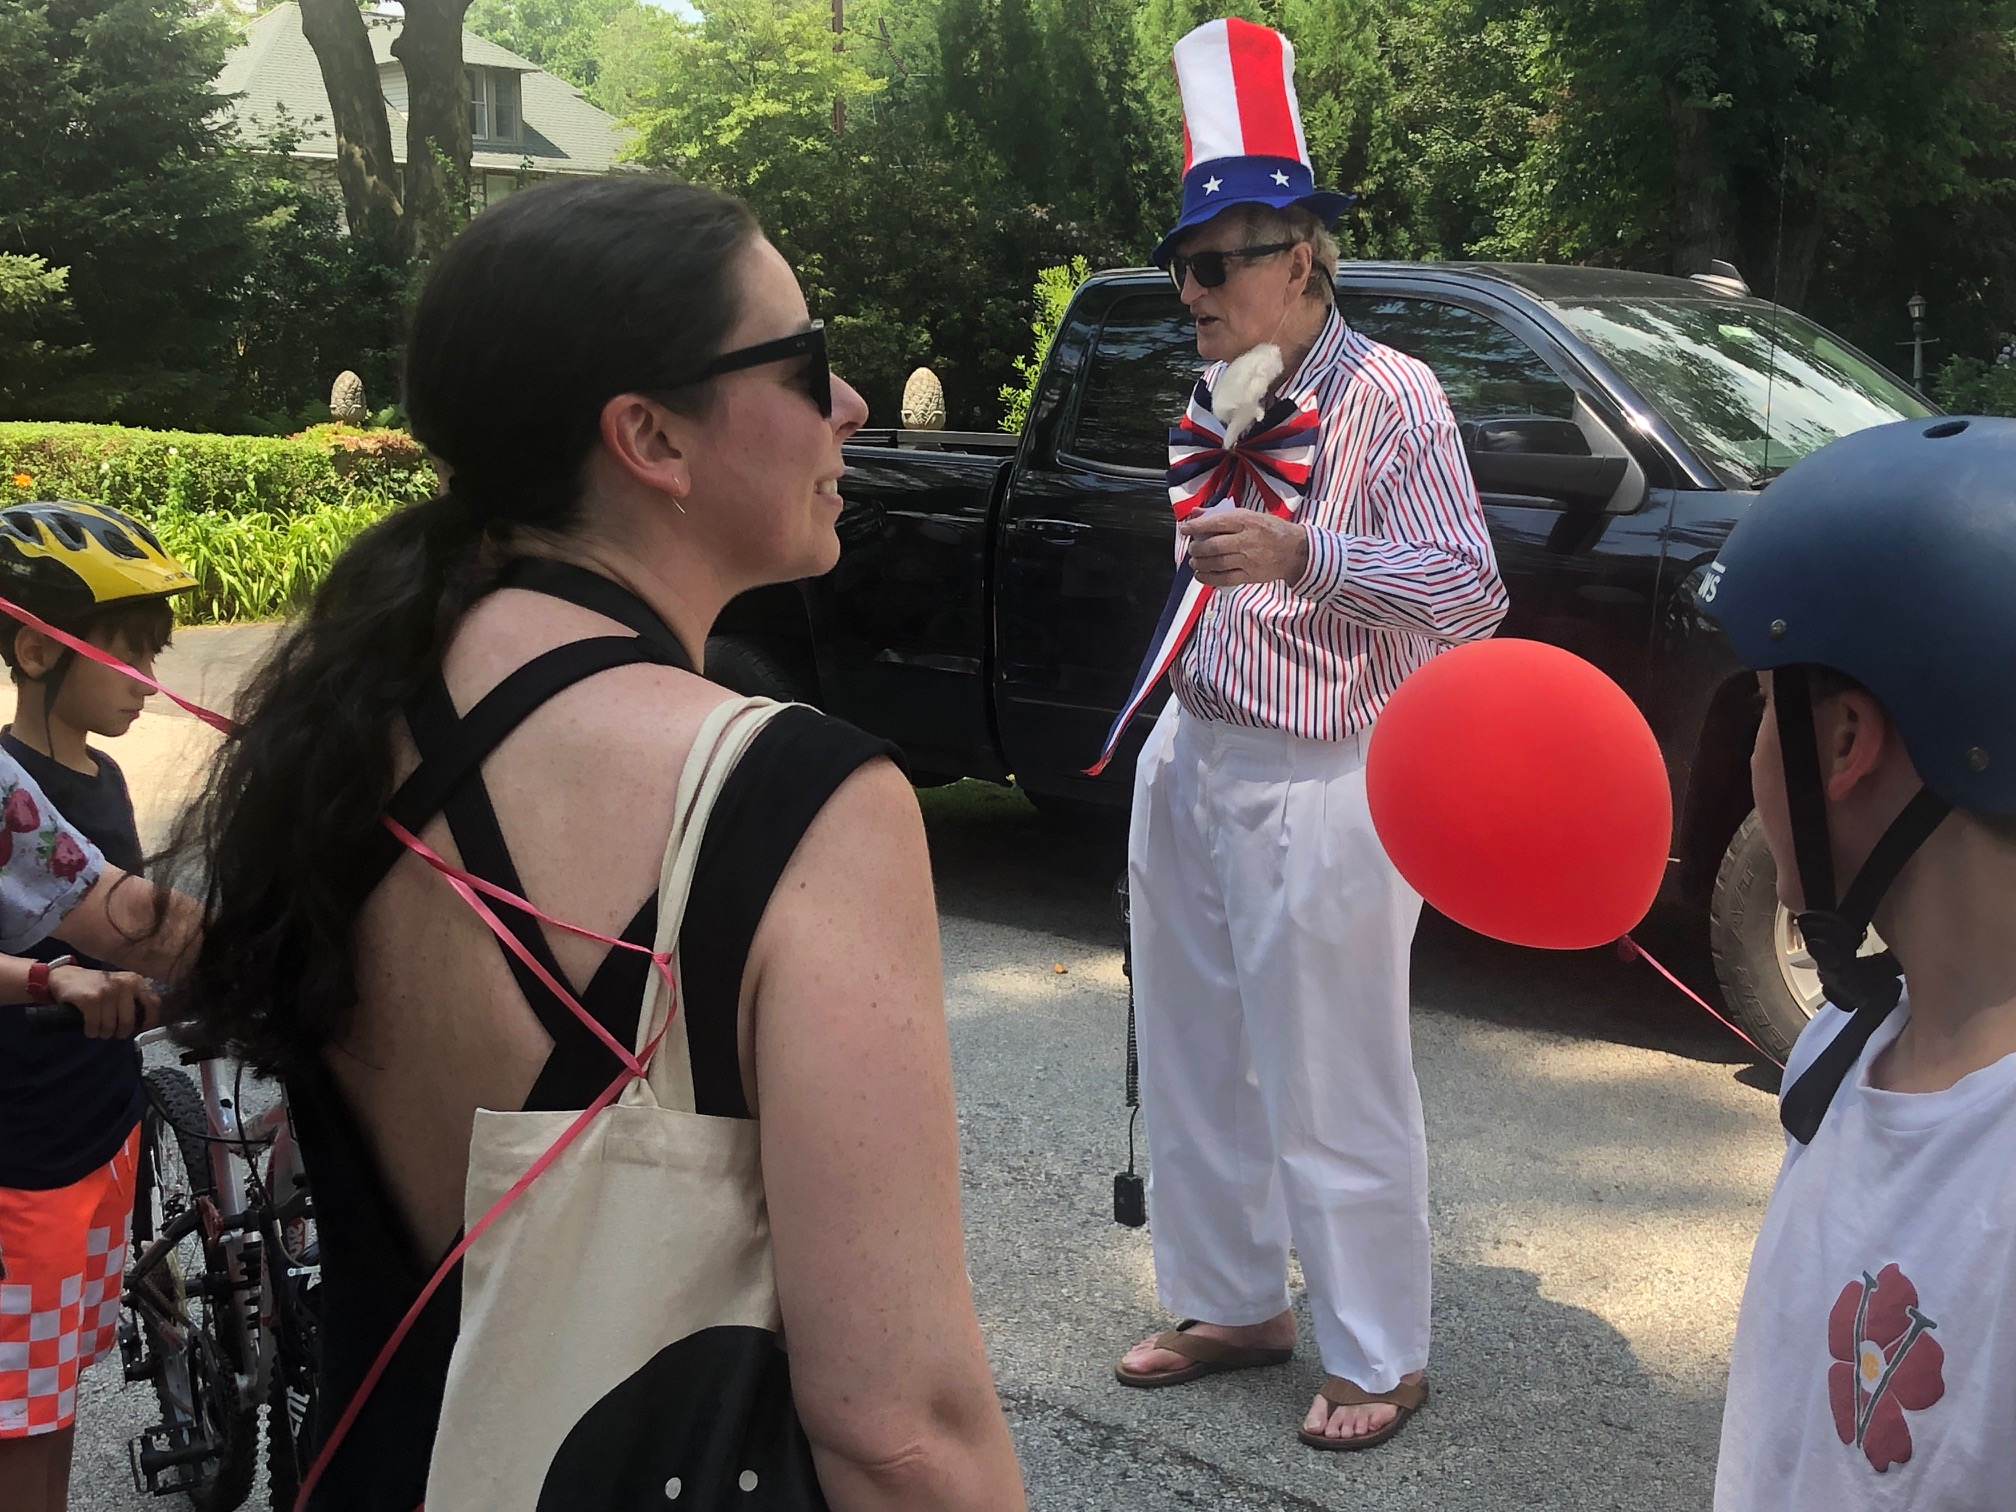 Mayor Tim Plummer of Rose Valley dressed as Uncle Sam